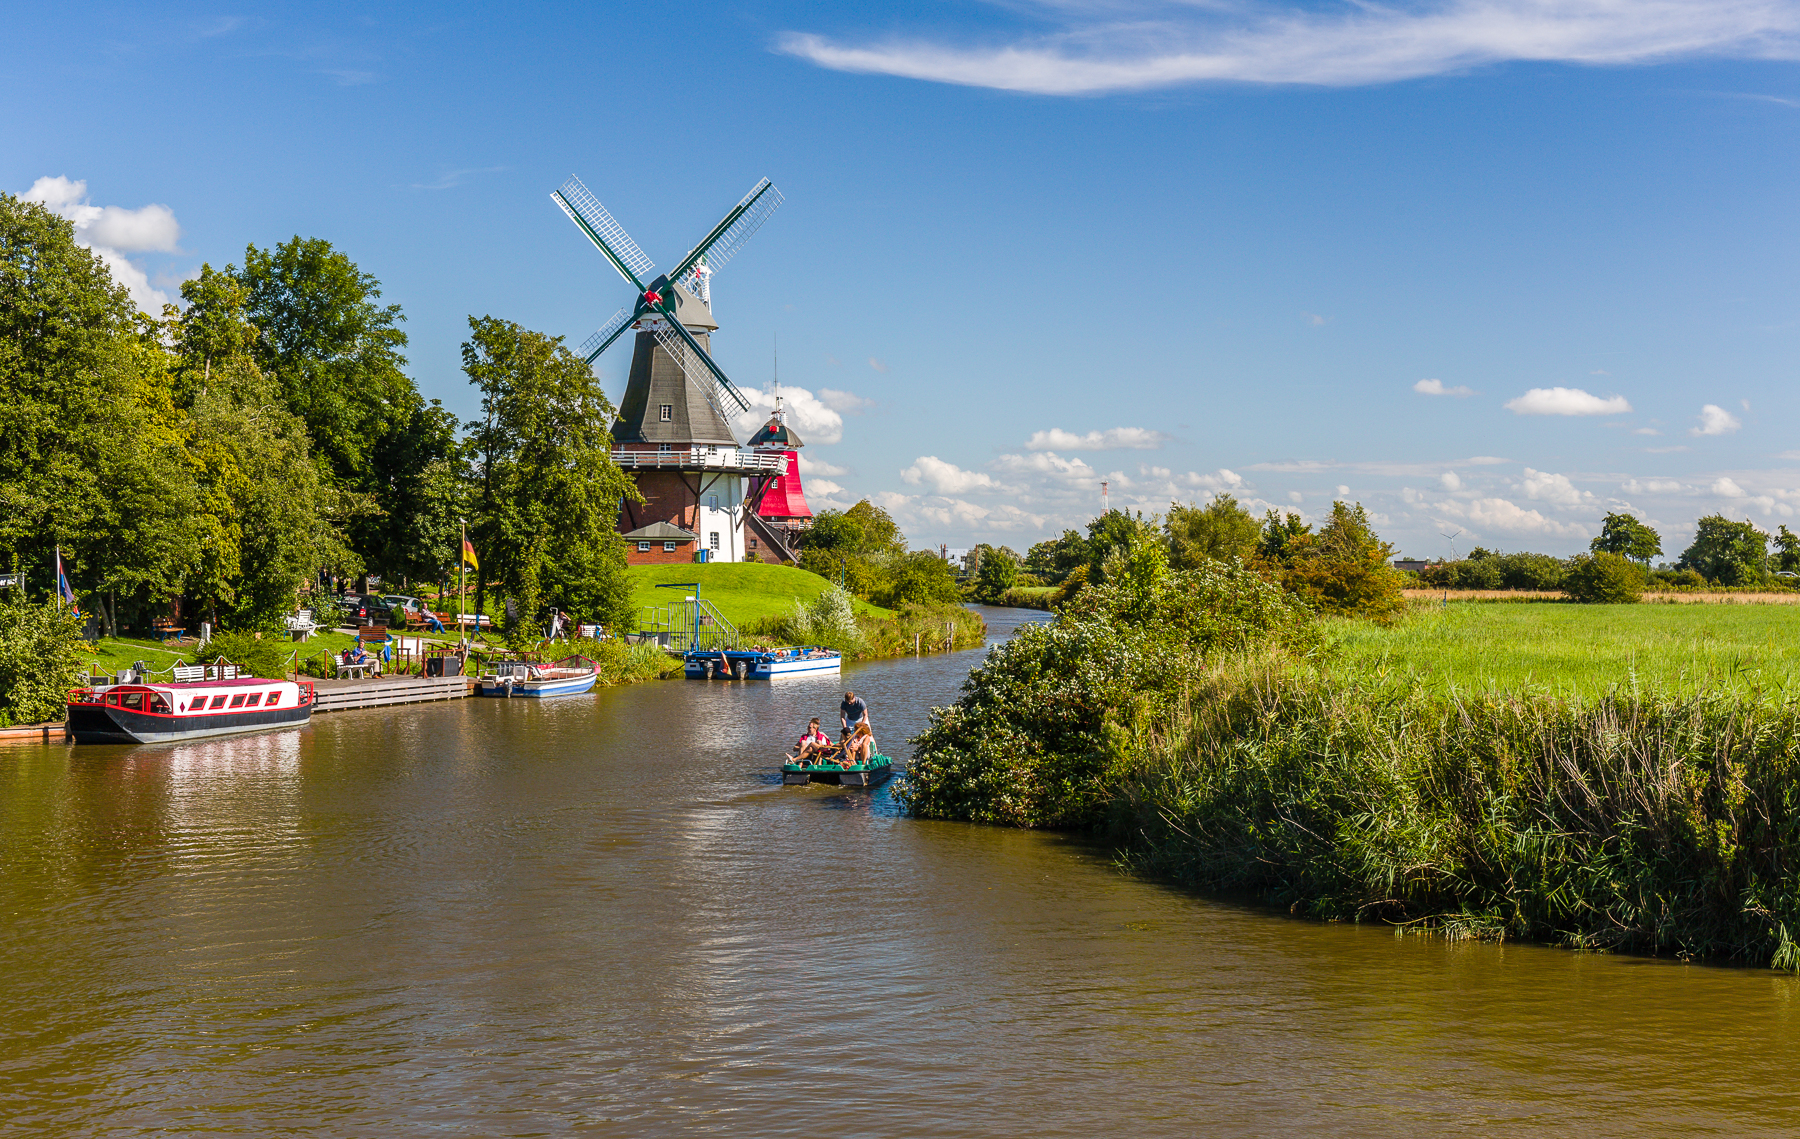 Windmills in Greetsiel, Germany